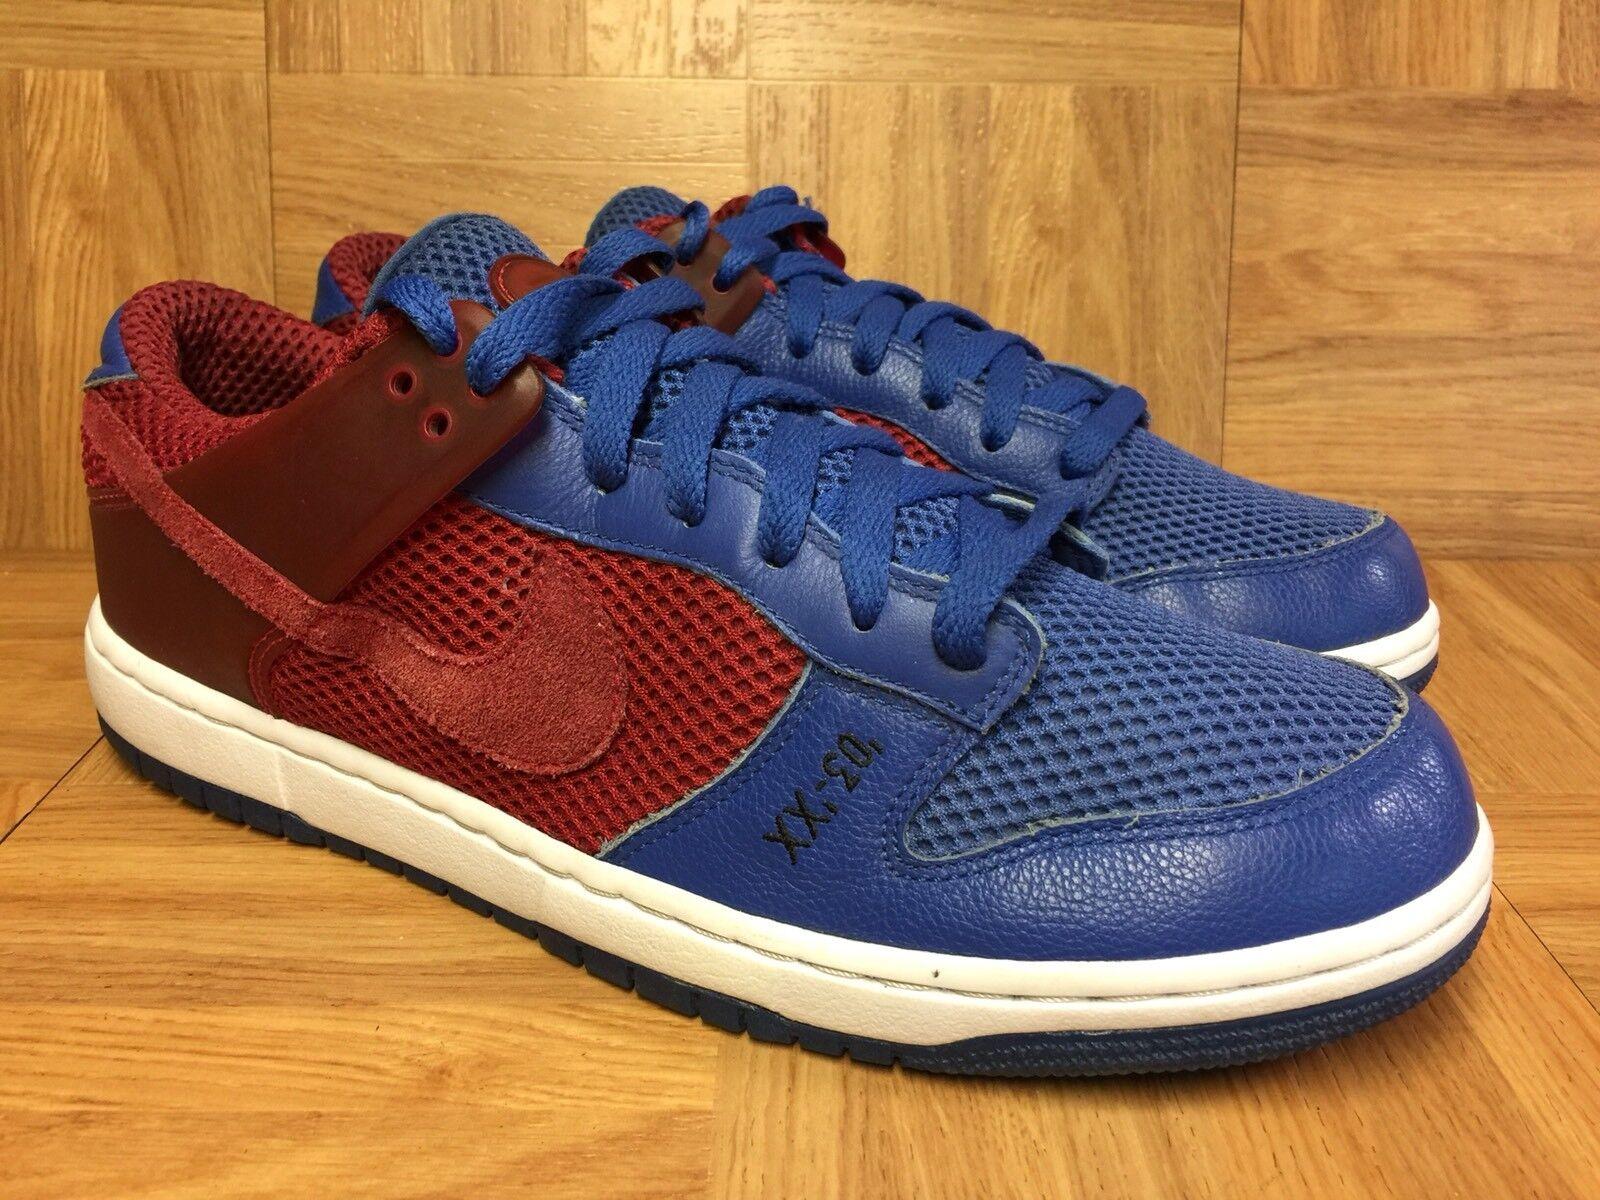 RARE Nike Zoom Dunkesto Dunkesto Dunkesto Varsity Red Dunk Presto Royal 10.5 Clippers 315207-661 233c4e